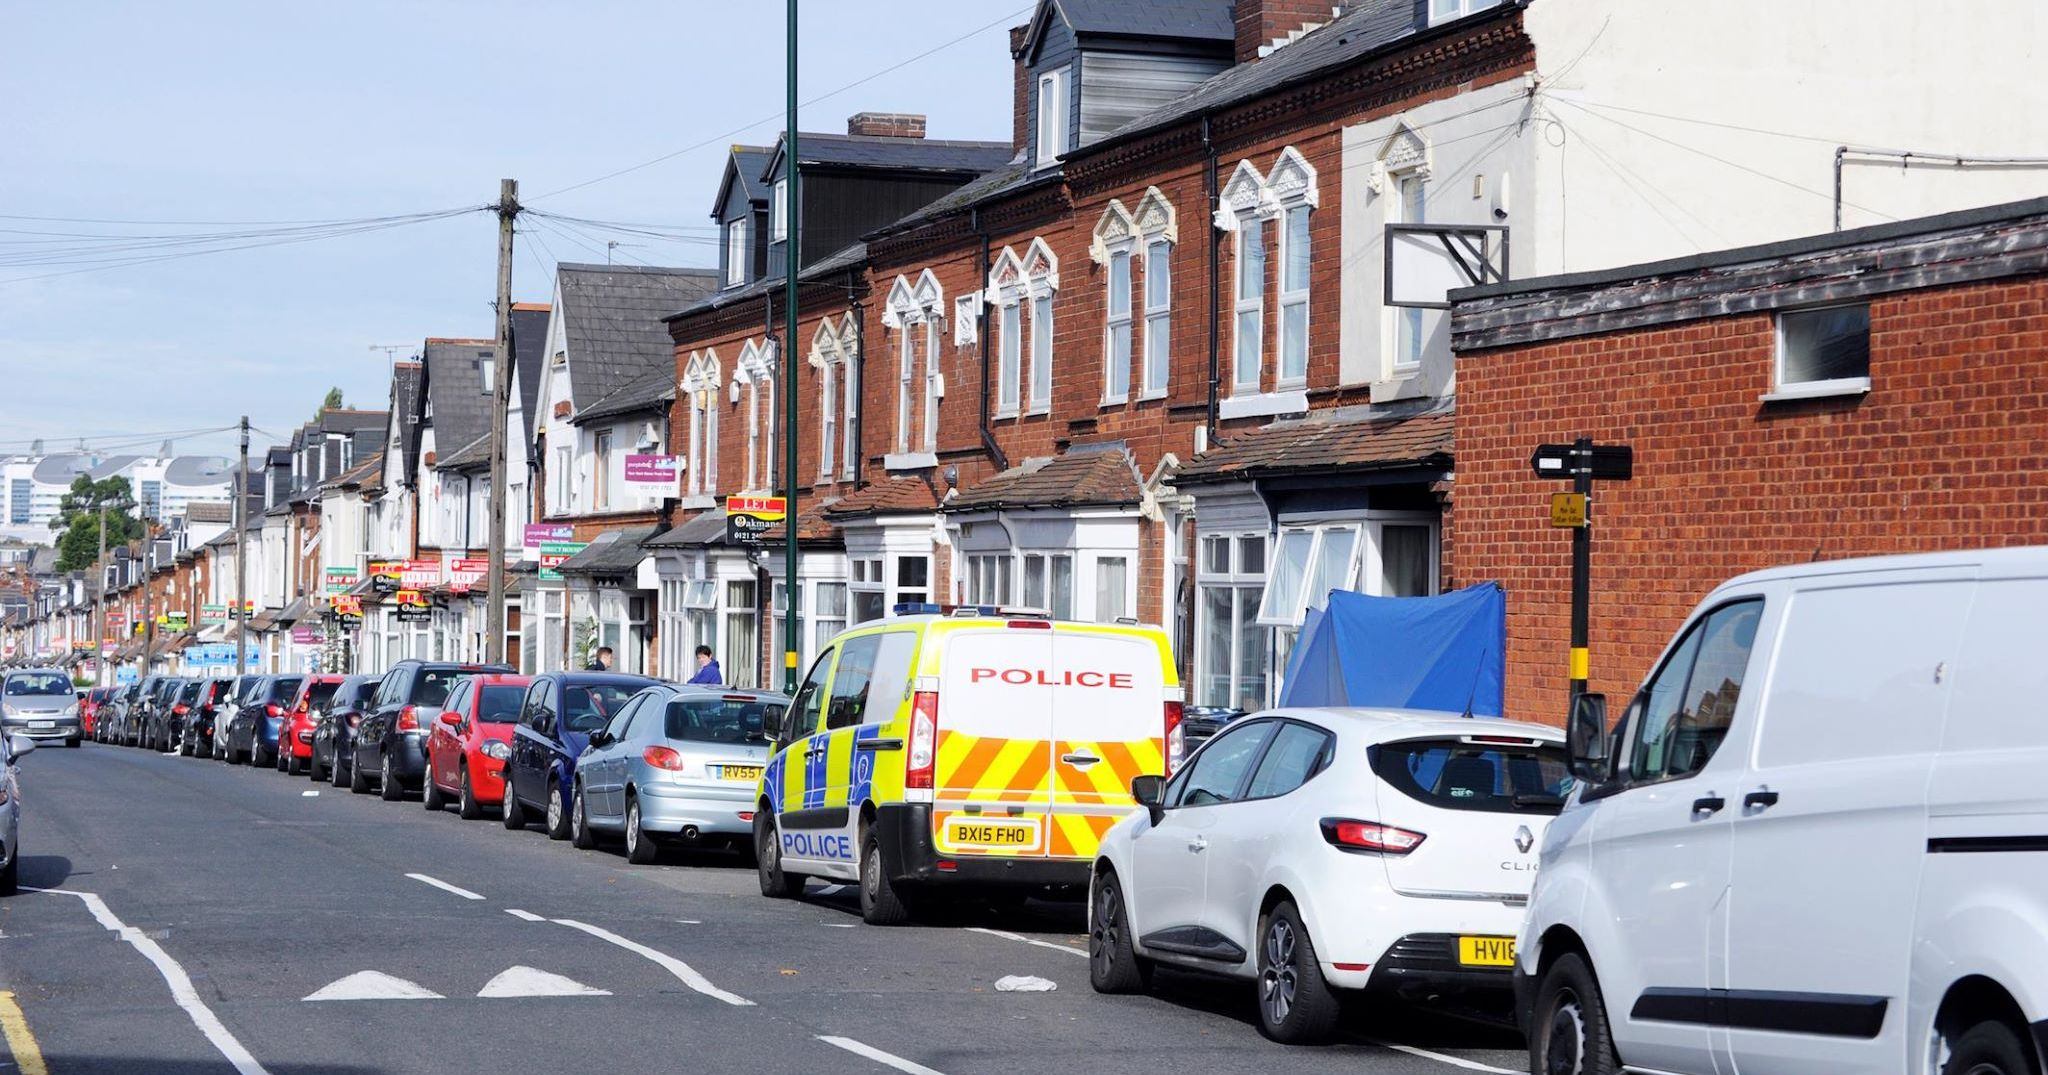 Image may contain: Brick, Vehicle, Van, Transportation, Hospital, Clinic, Ambulance